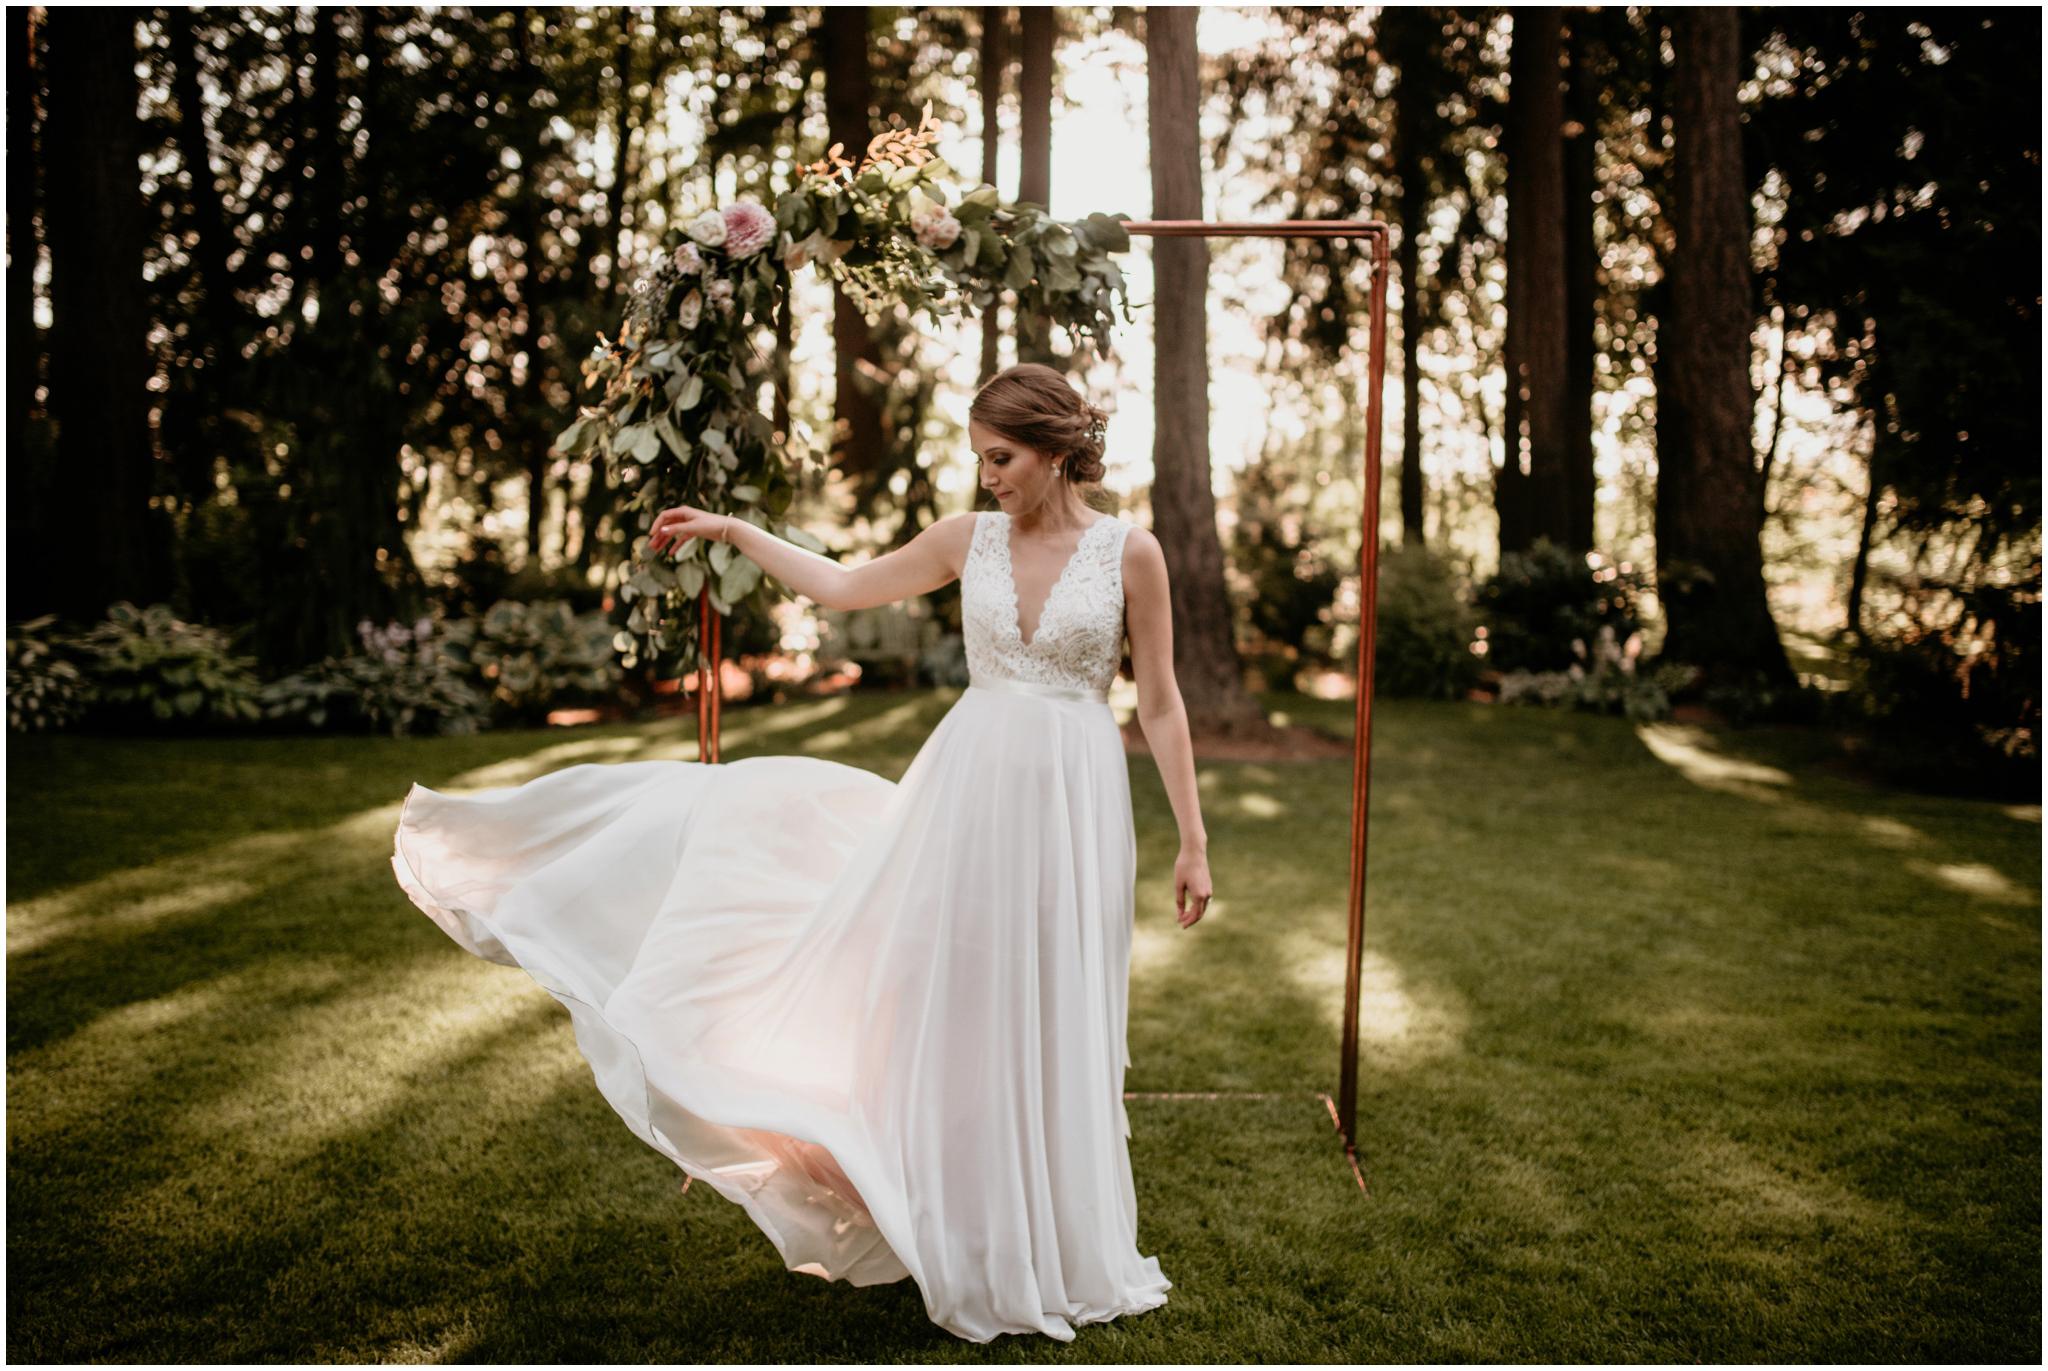 erin-and-tyler-evergreen-gardens-bellingham-wedding-photographer-128.jpg